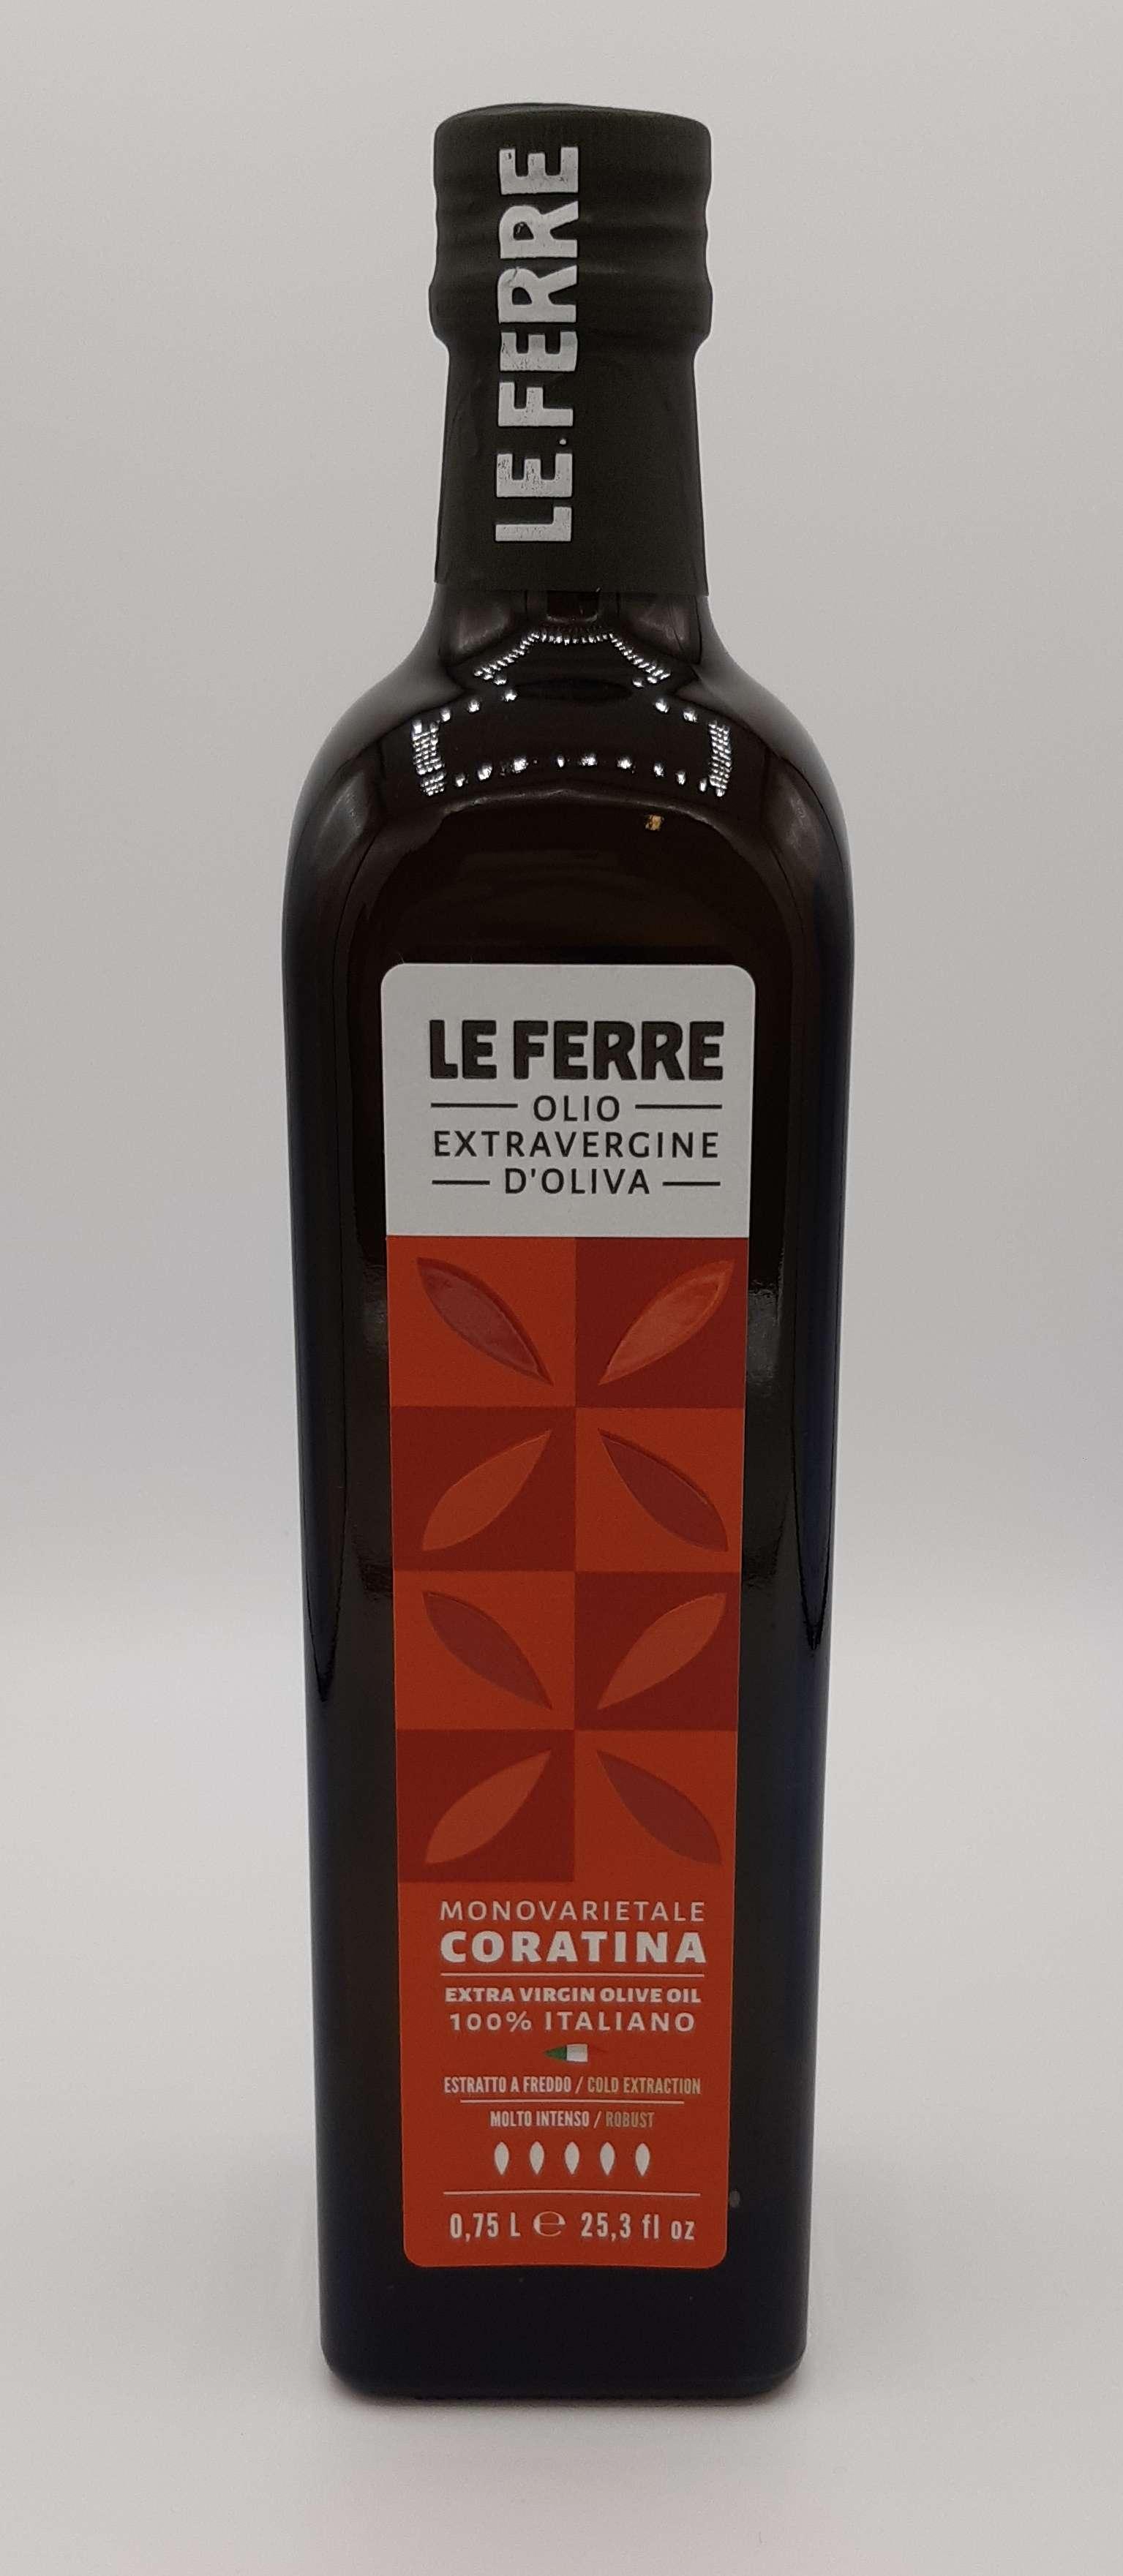 La Ferre Coratina EV Olive Oil